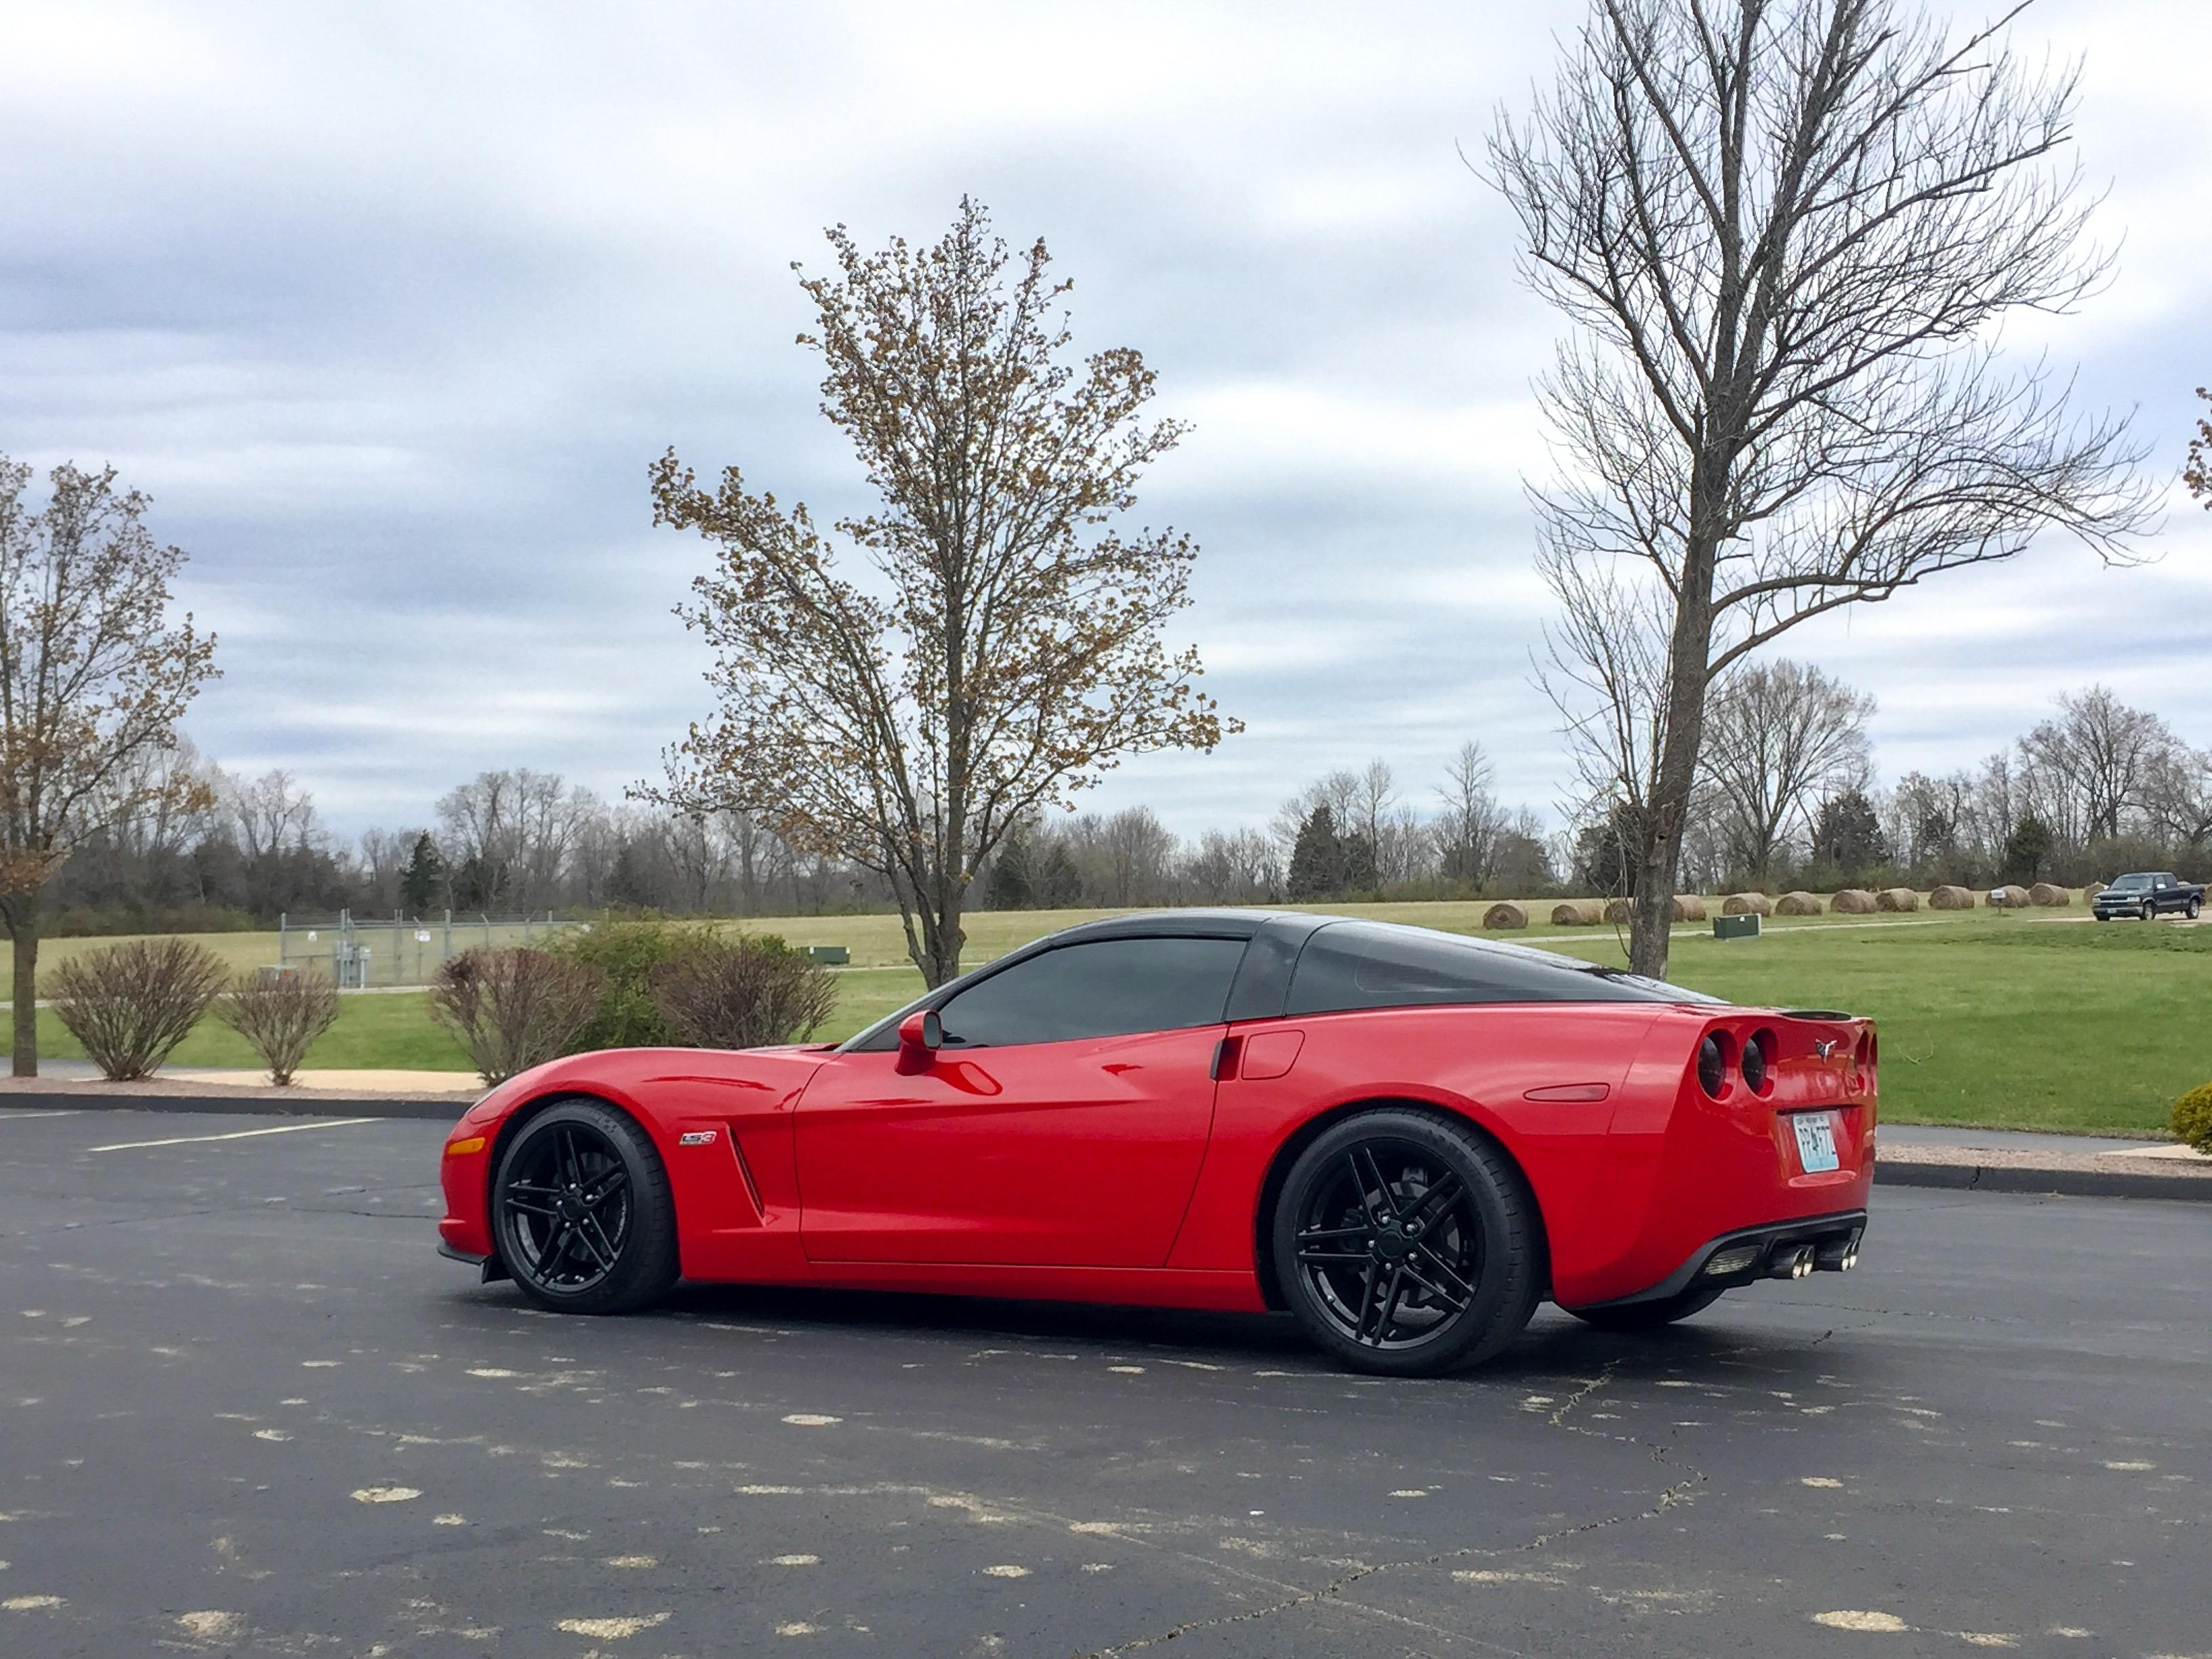 Corvette C6 Z06 Wheels Oe Wheels Llc Autos Post